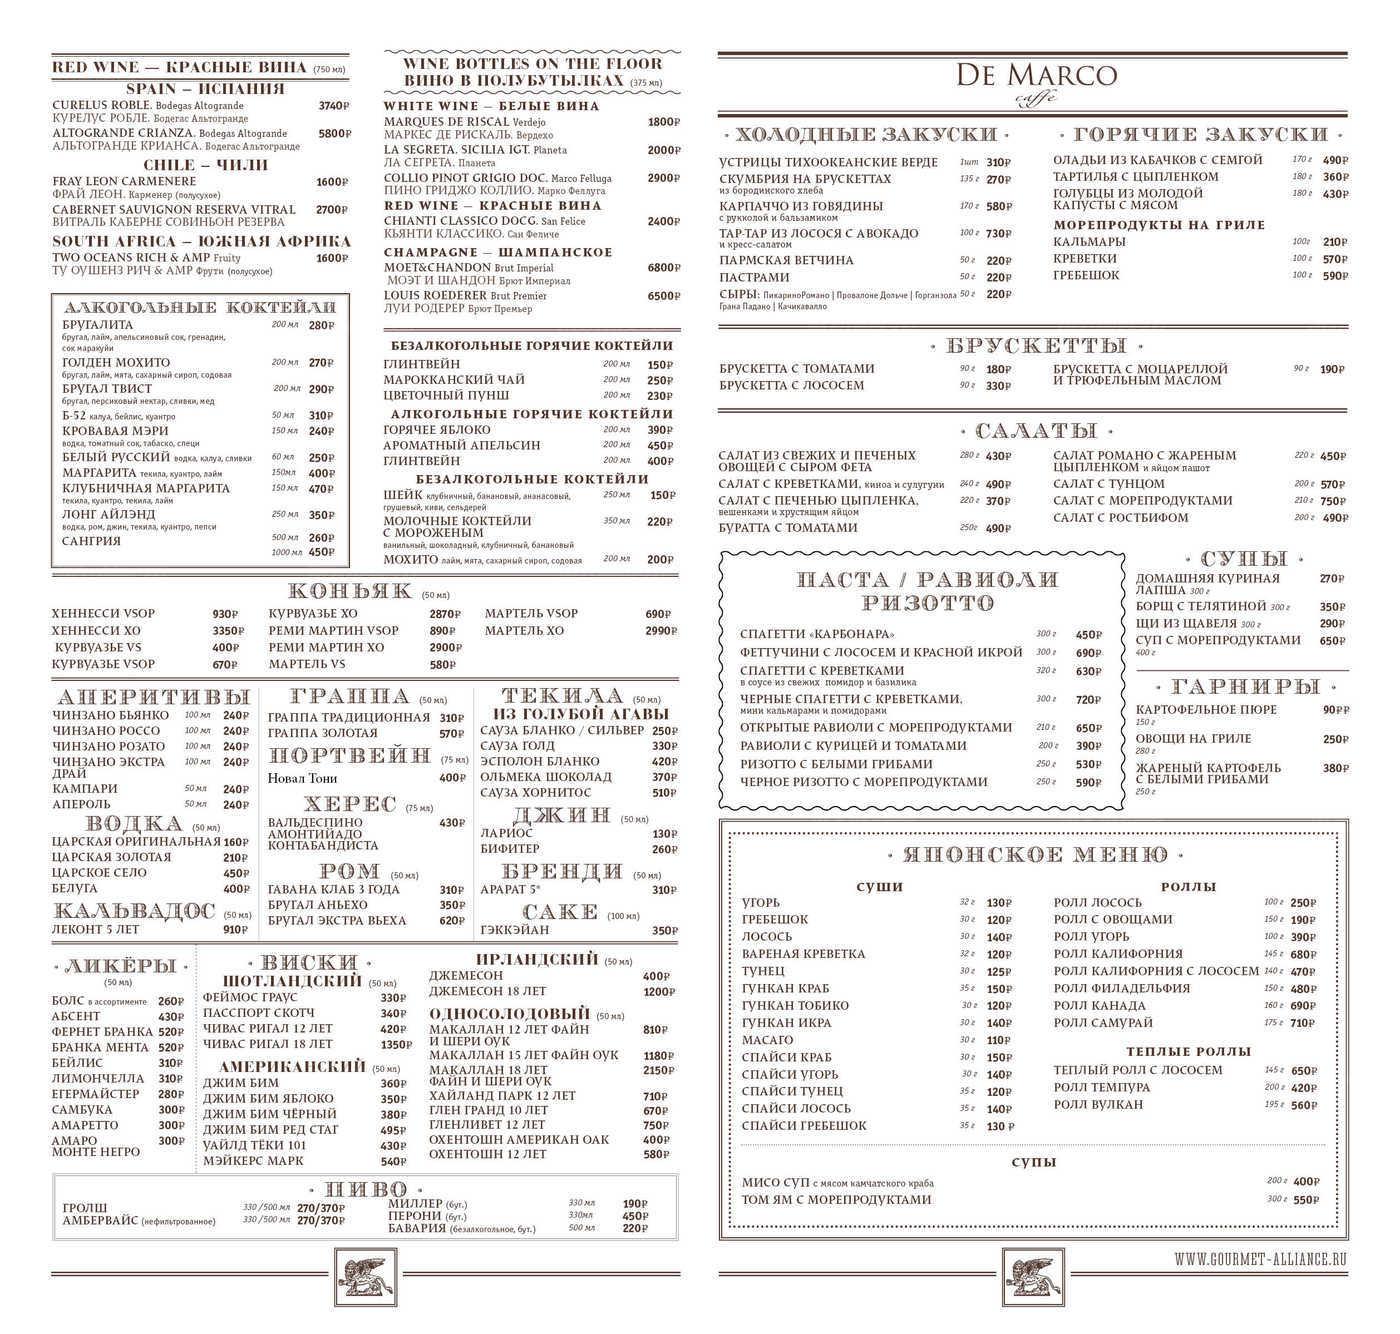 Меню караоке клуба, кафе Де Марко Соло на улице Петровка